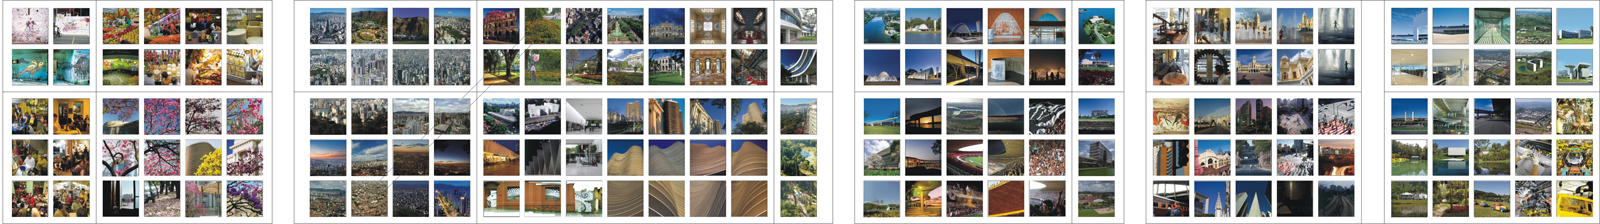 04_Sala-bh-7 copy.jpg